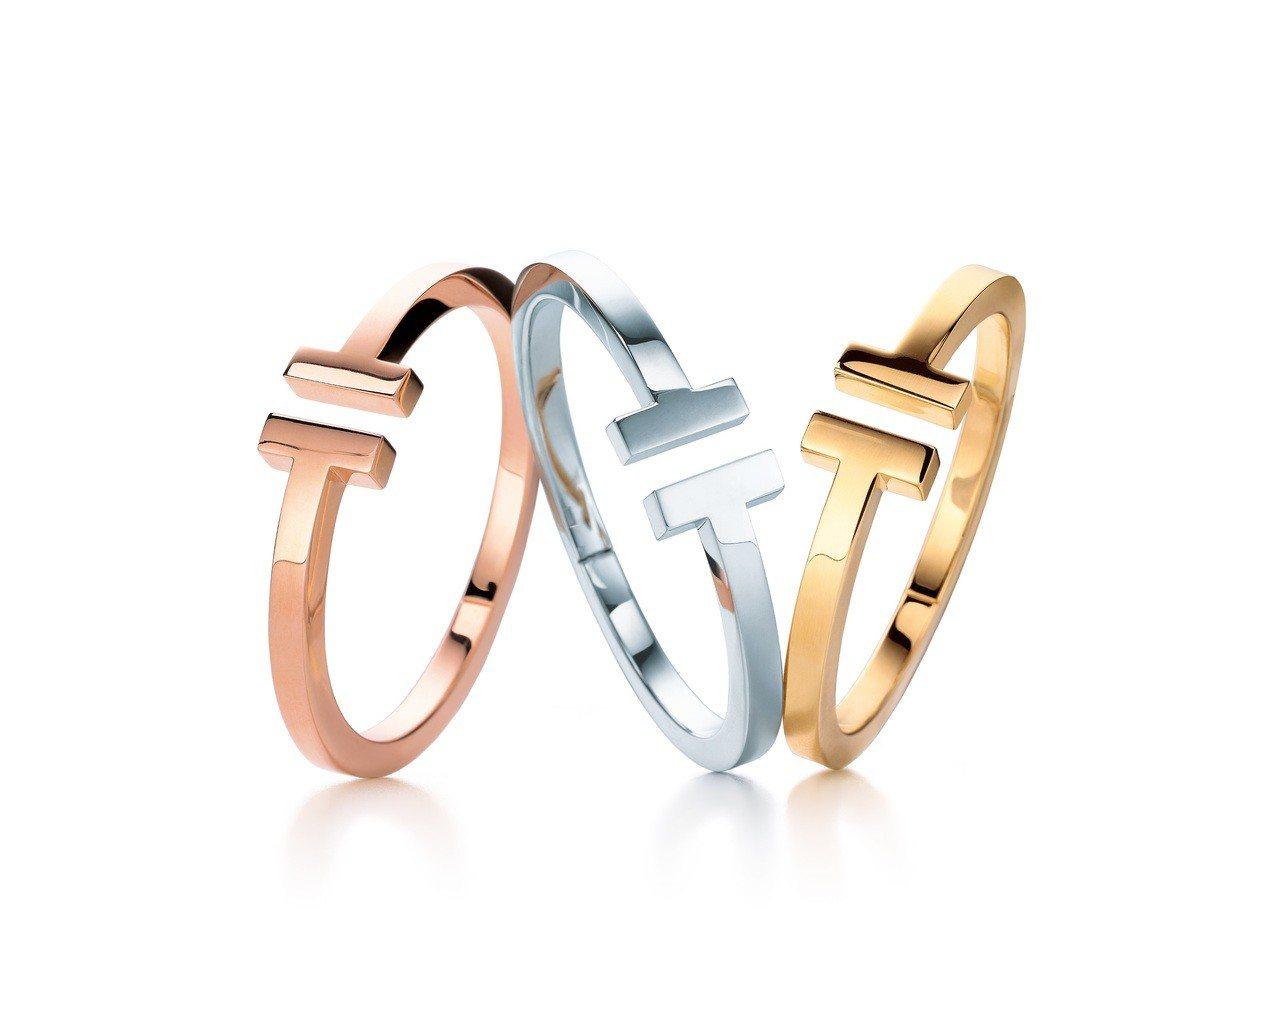 Tiffany T Square 手環18K玫瑰金、18K白金 、18K黃金,各...